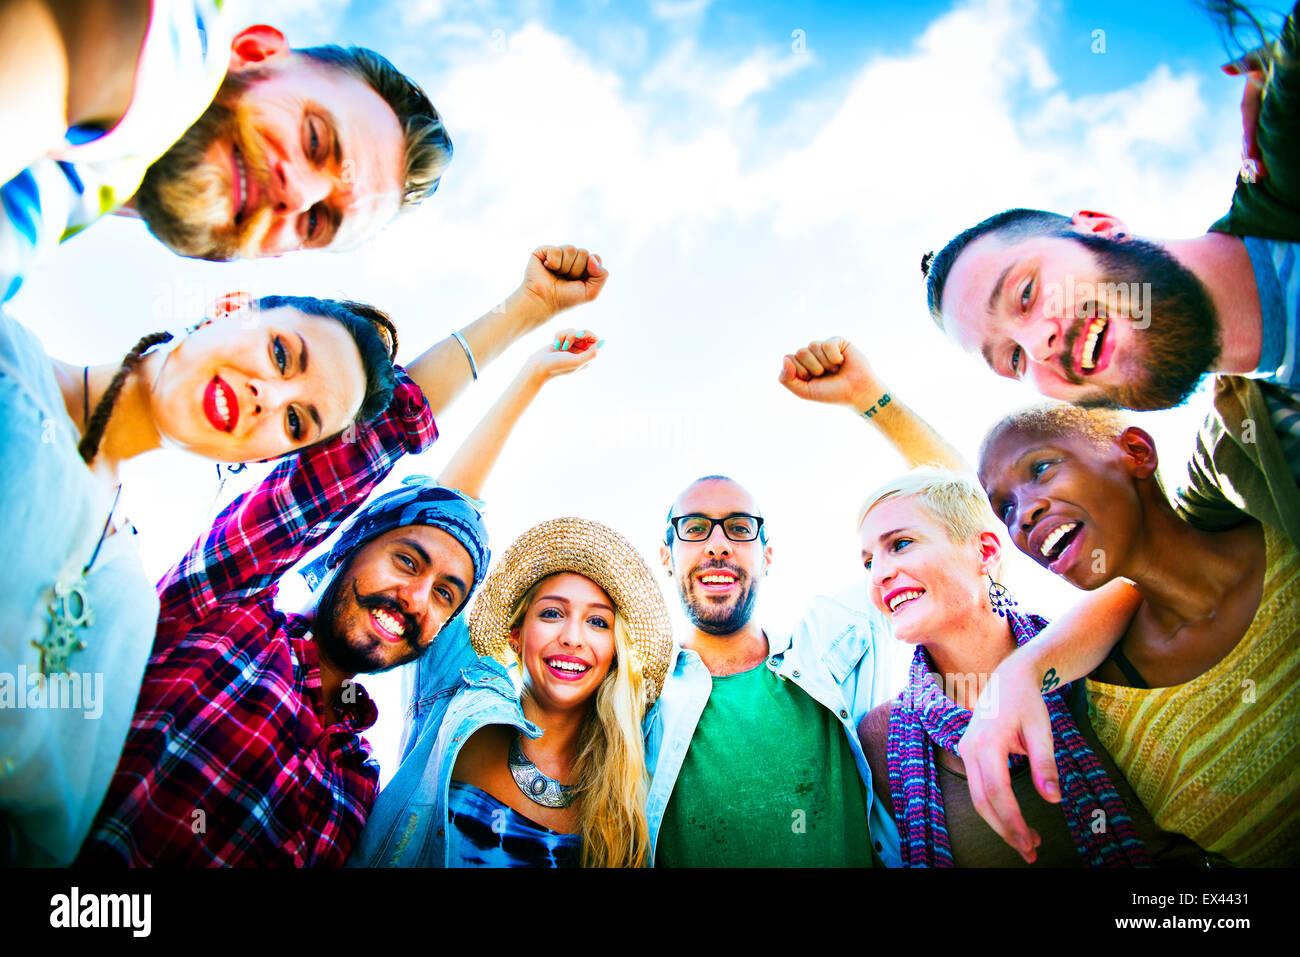 Huddle Join Holiday Party Freundesgruppe Konzept Stockfoto